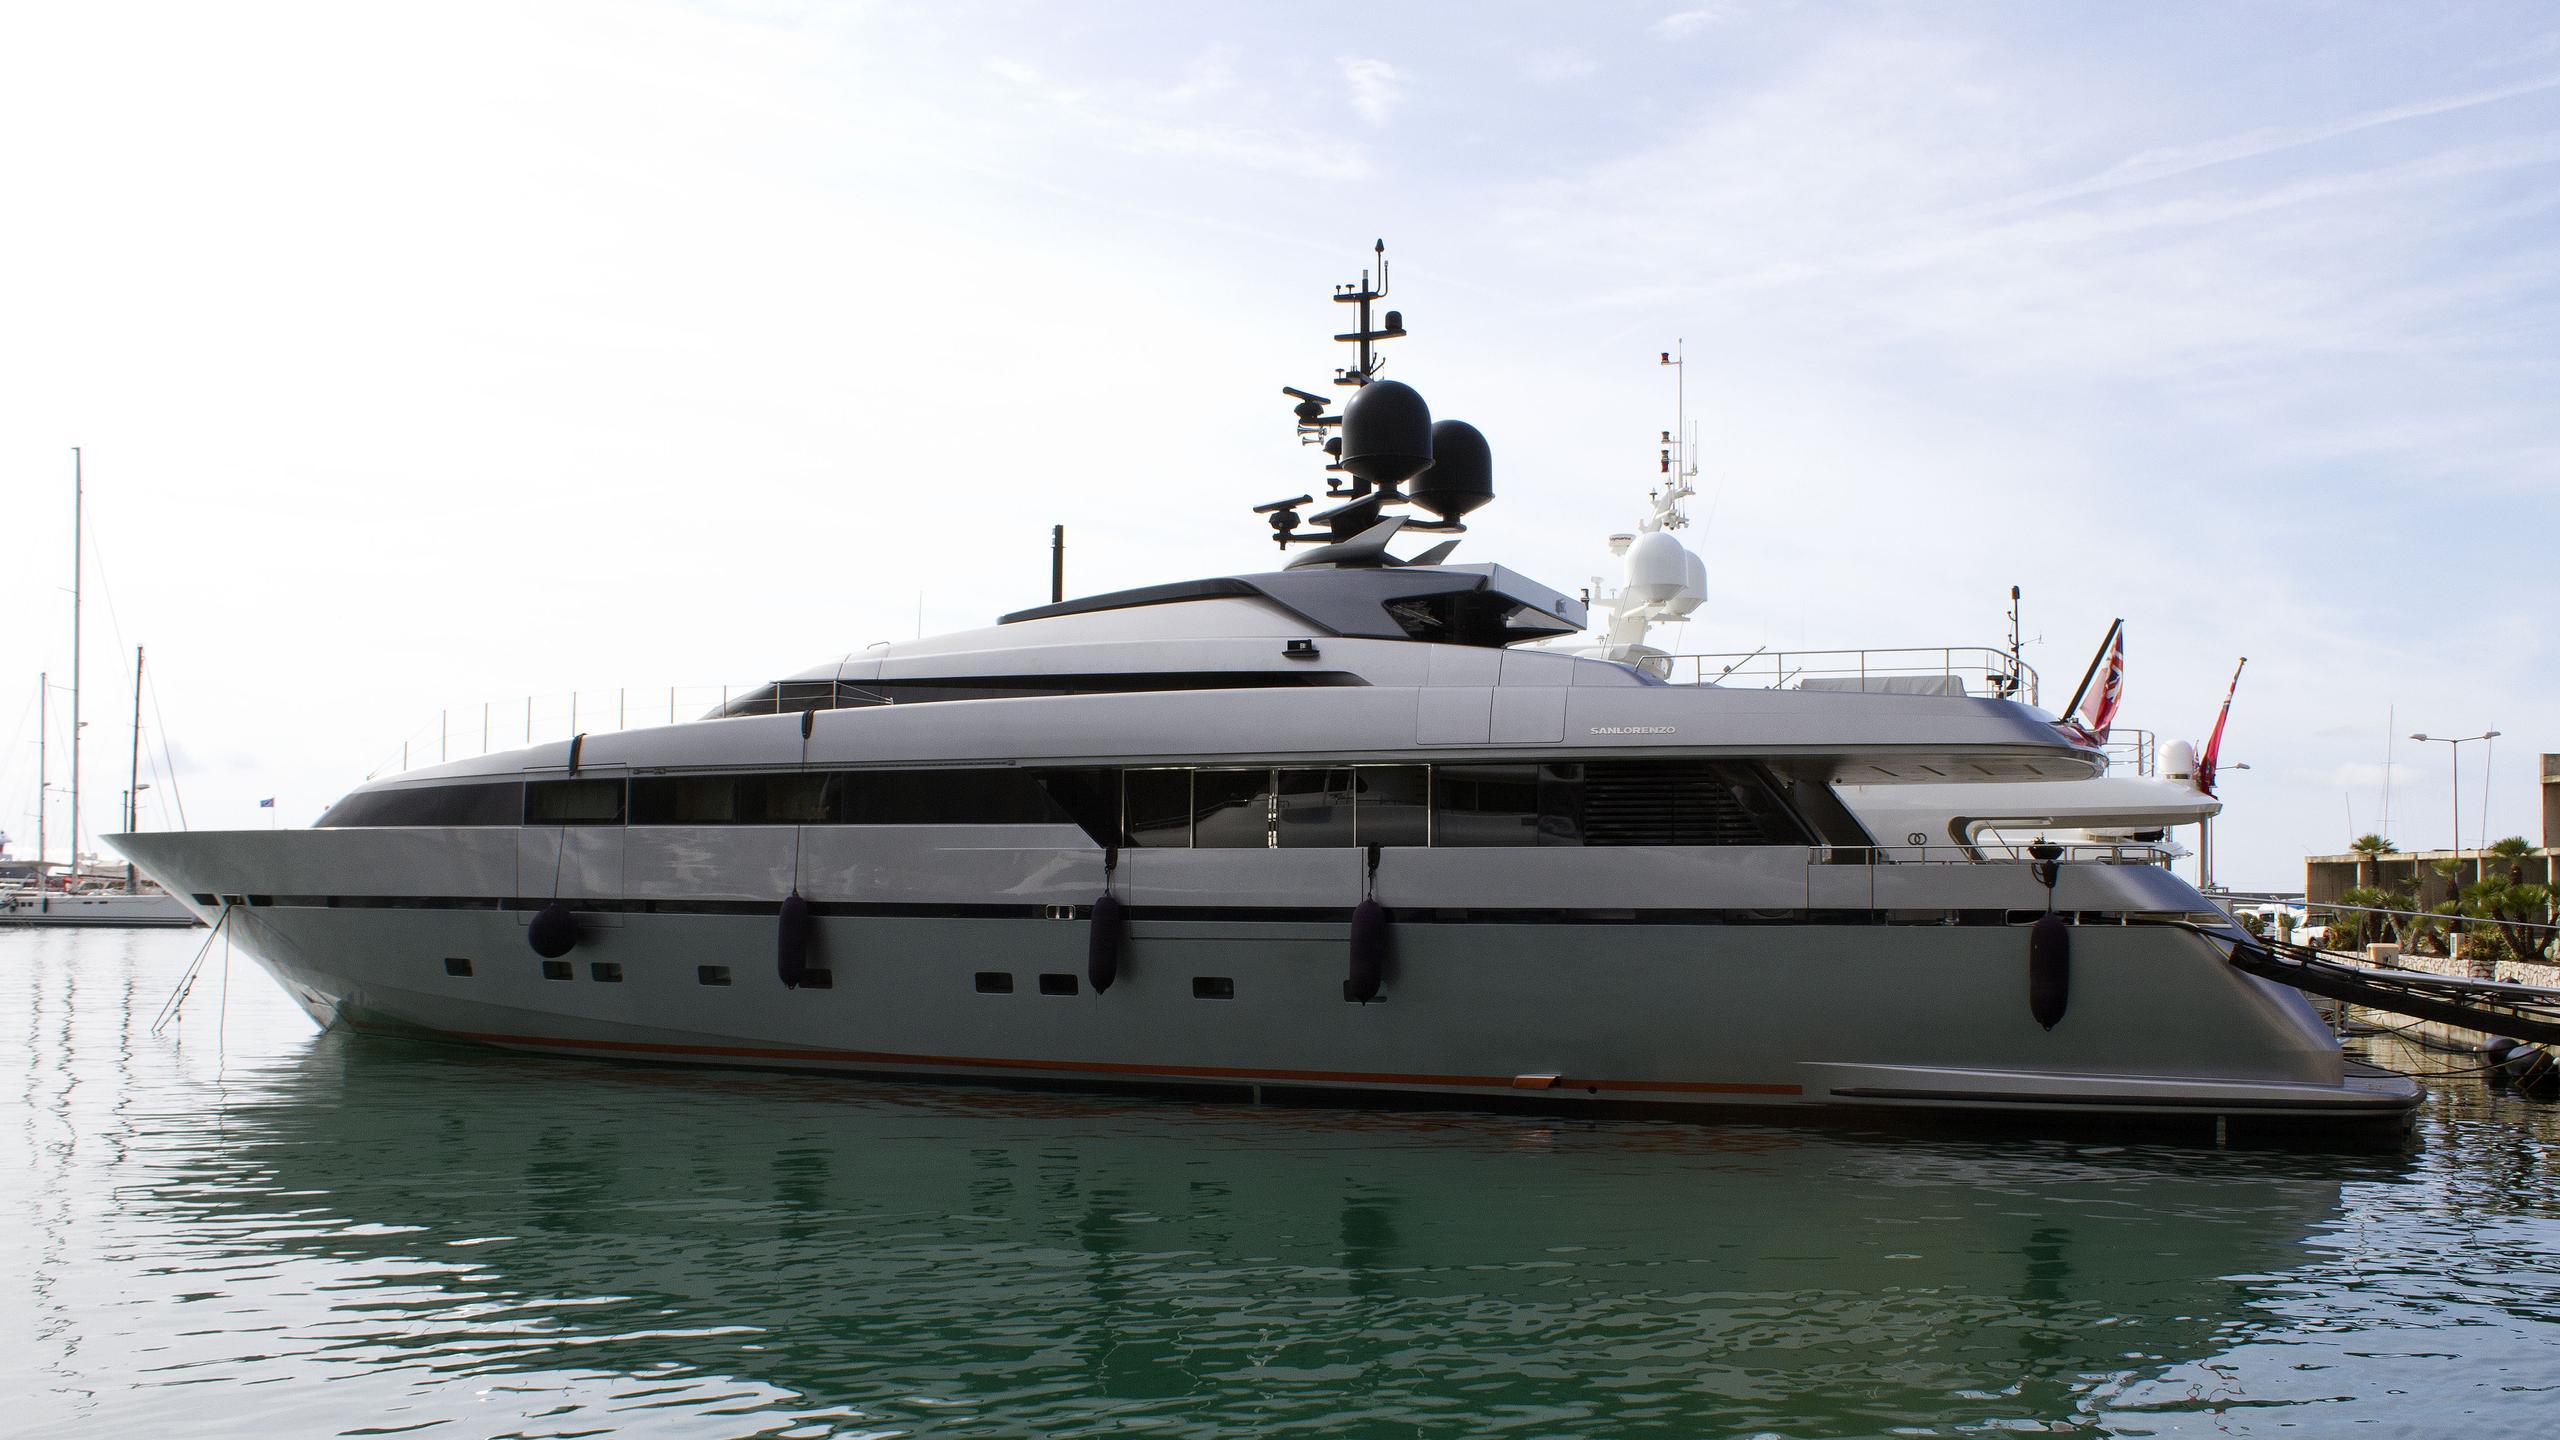 lena-motor-ycht-sanlorenzo-2010-41m-profile